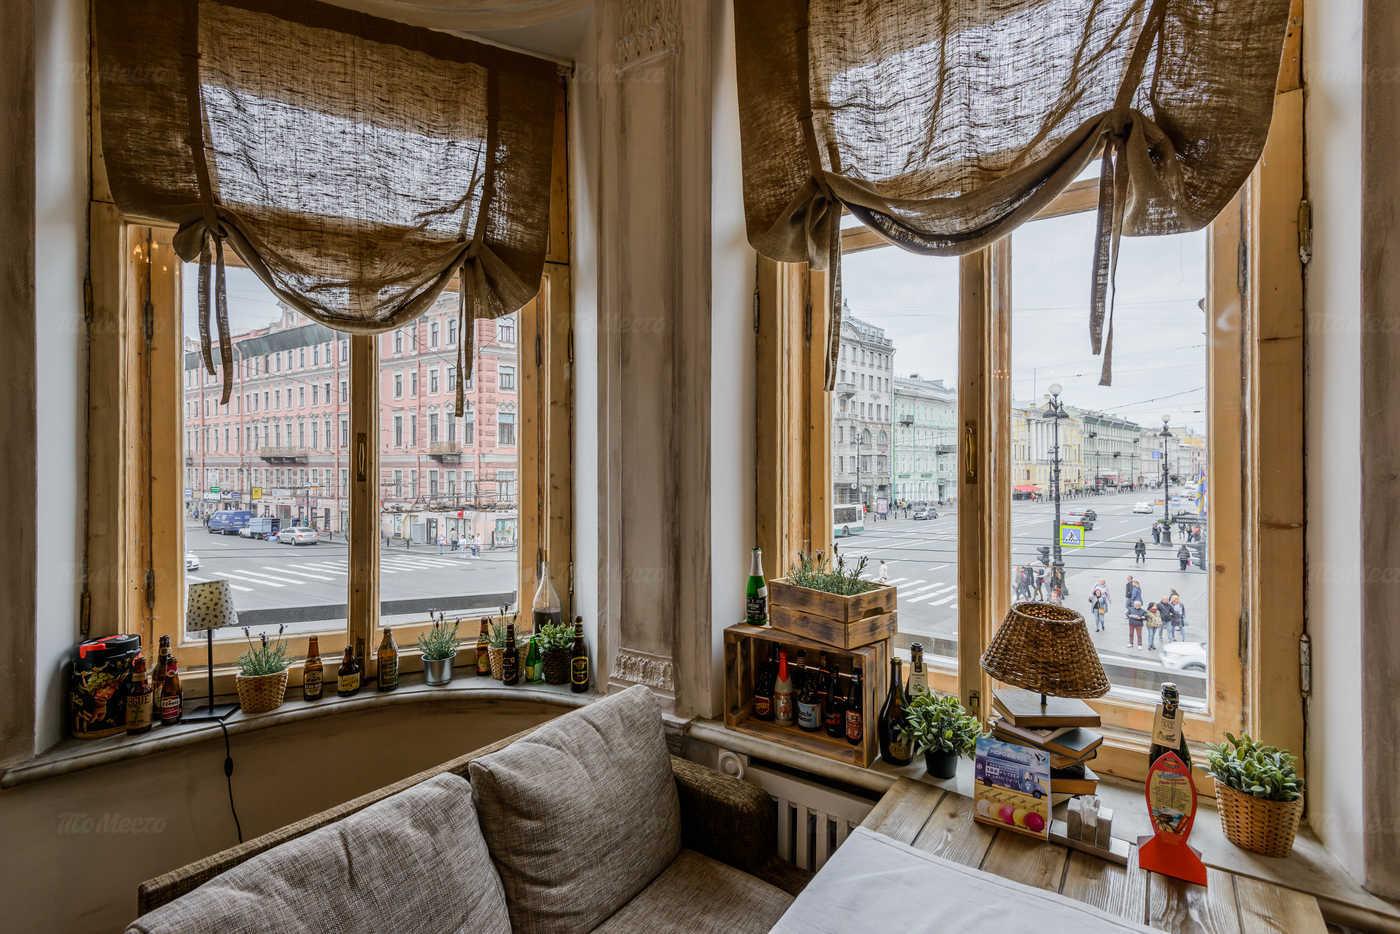 Ресторан Шато Винтаж (Chateau Vintage) на Невском проспекте фото 16